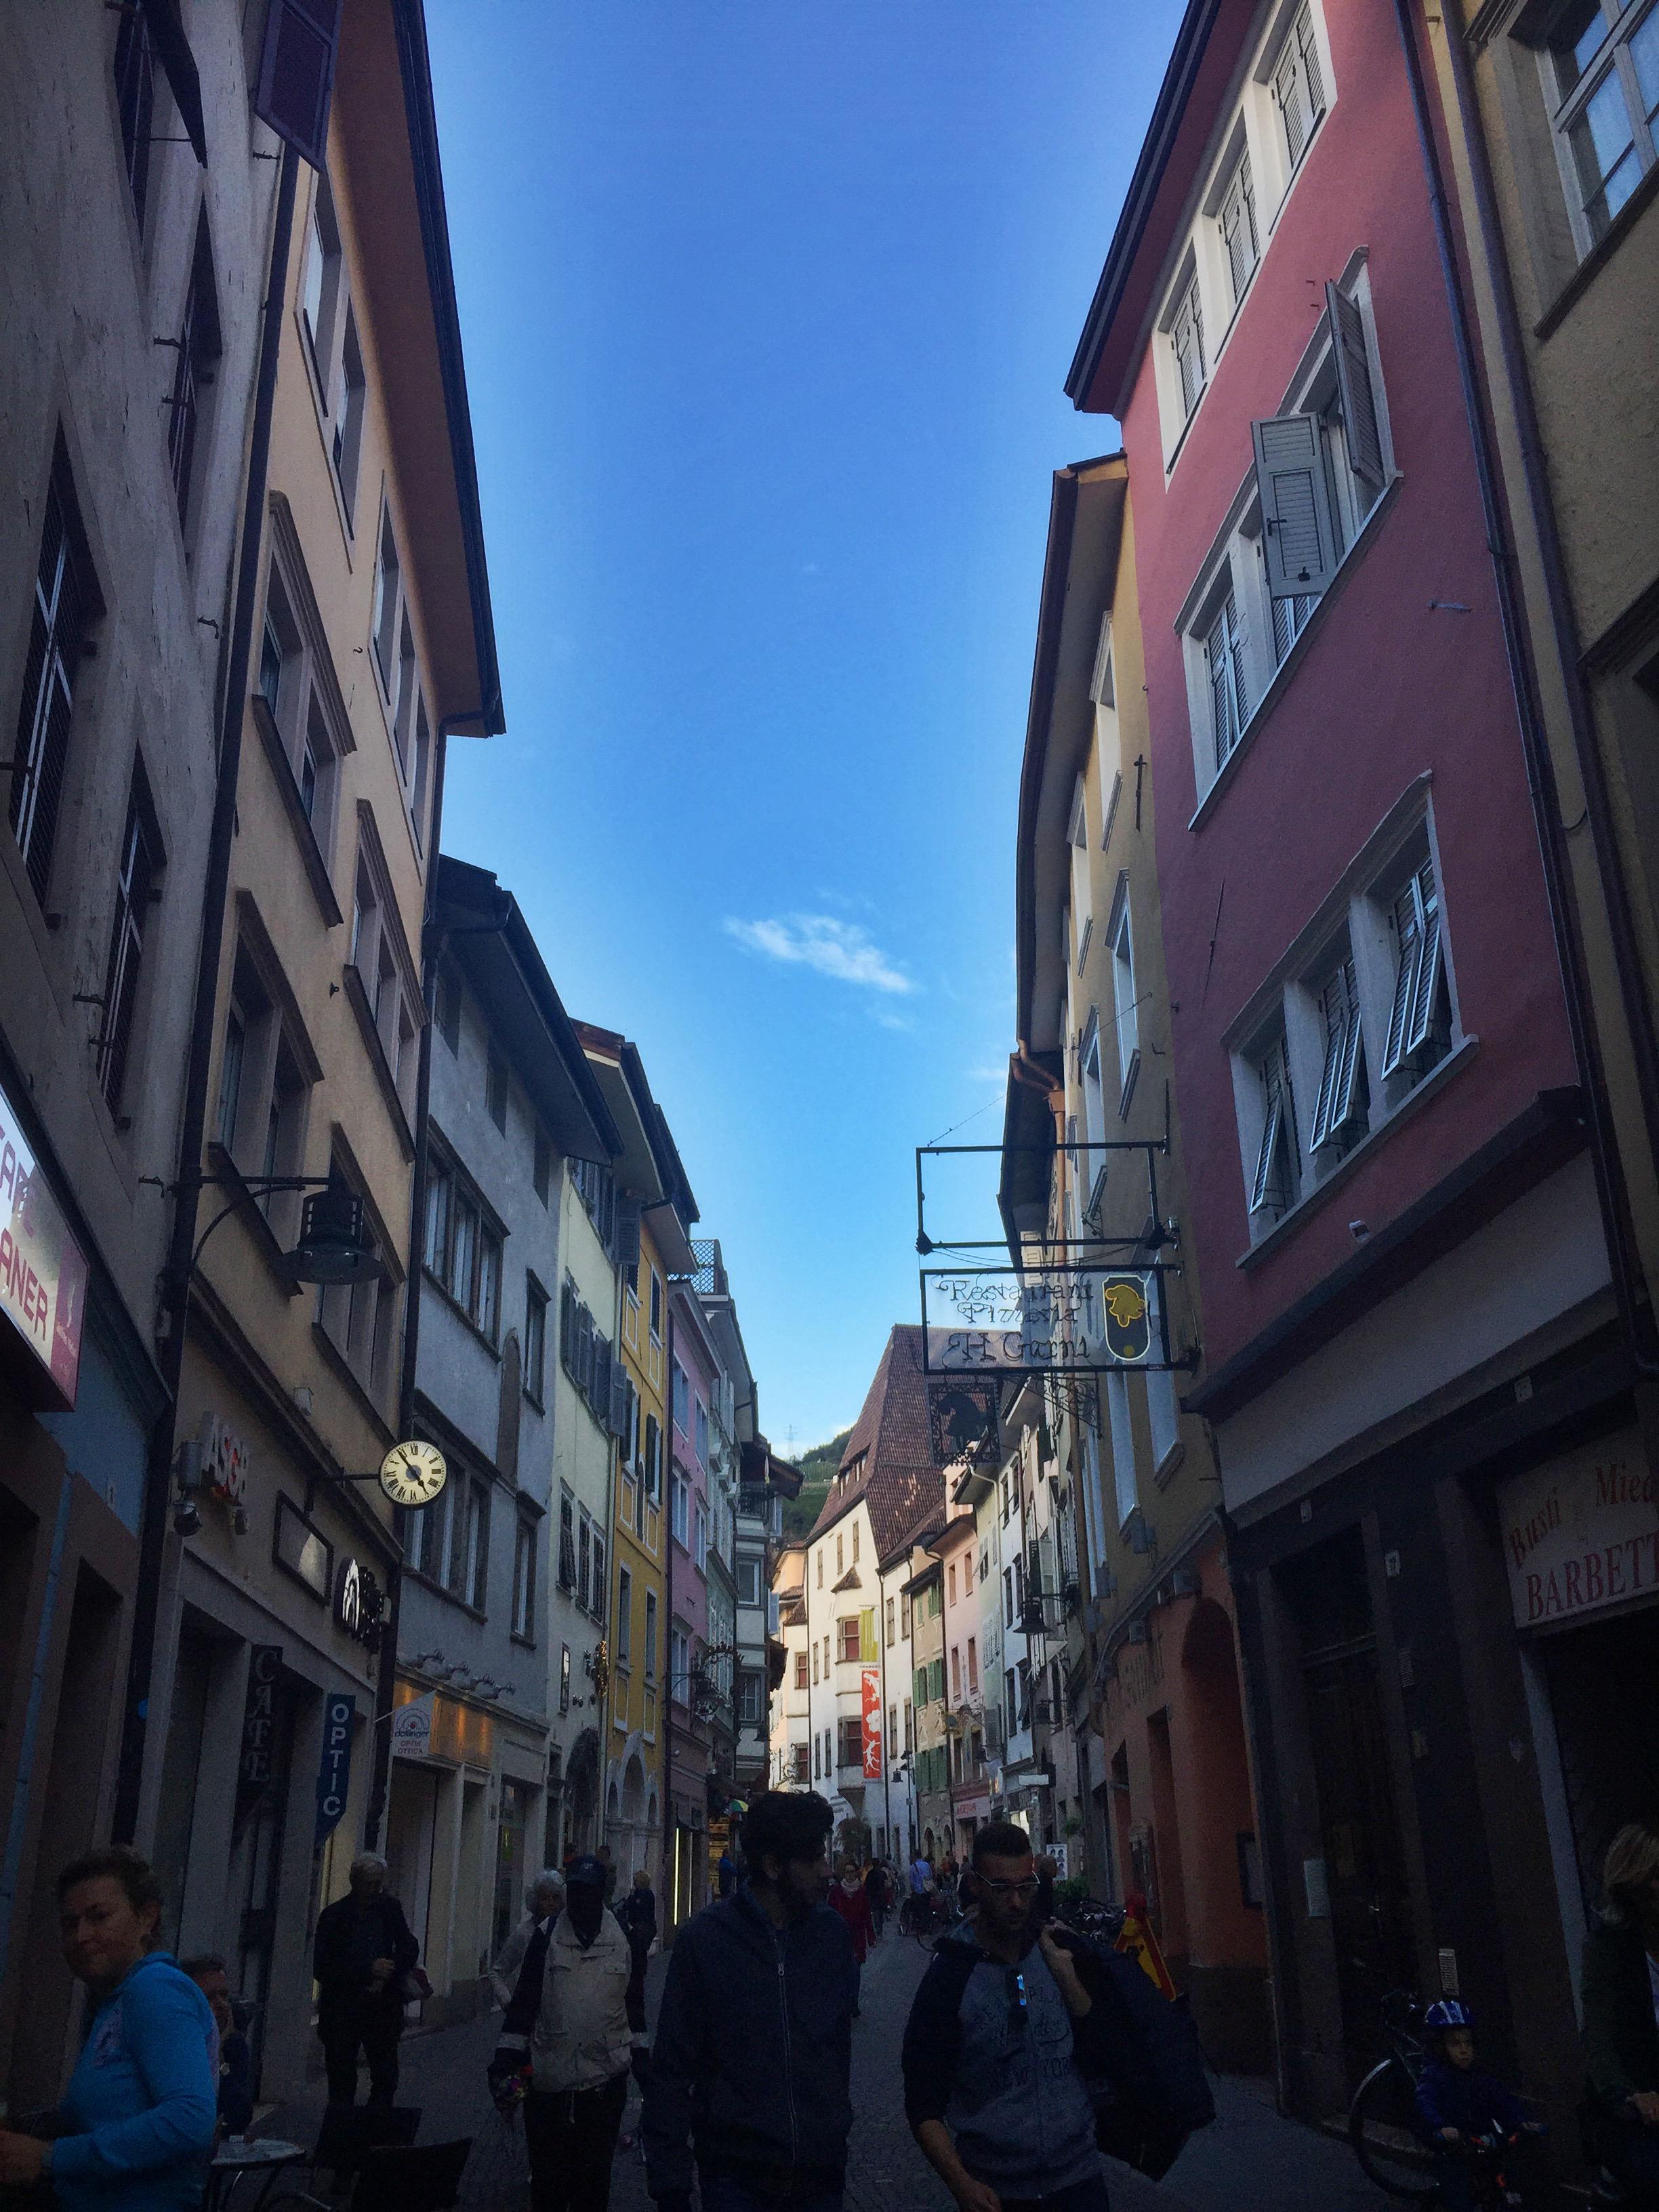 Street view in Bolzano/Bozen.